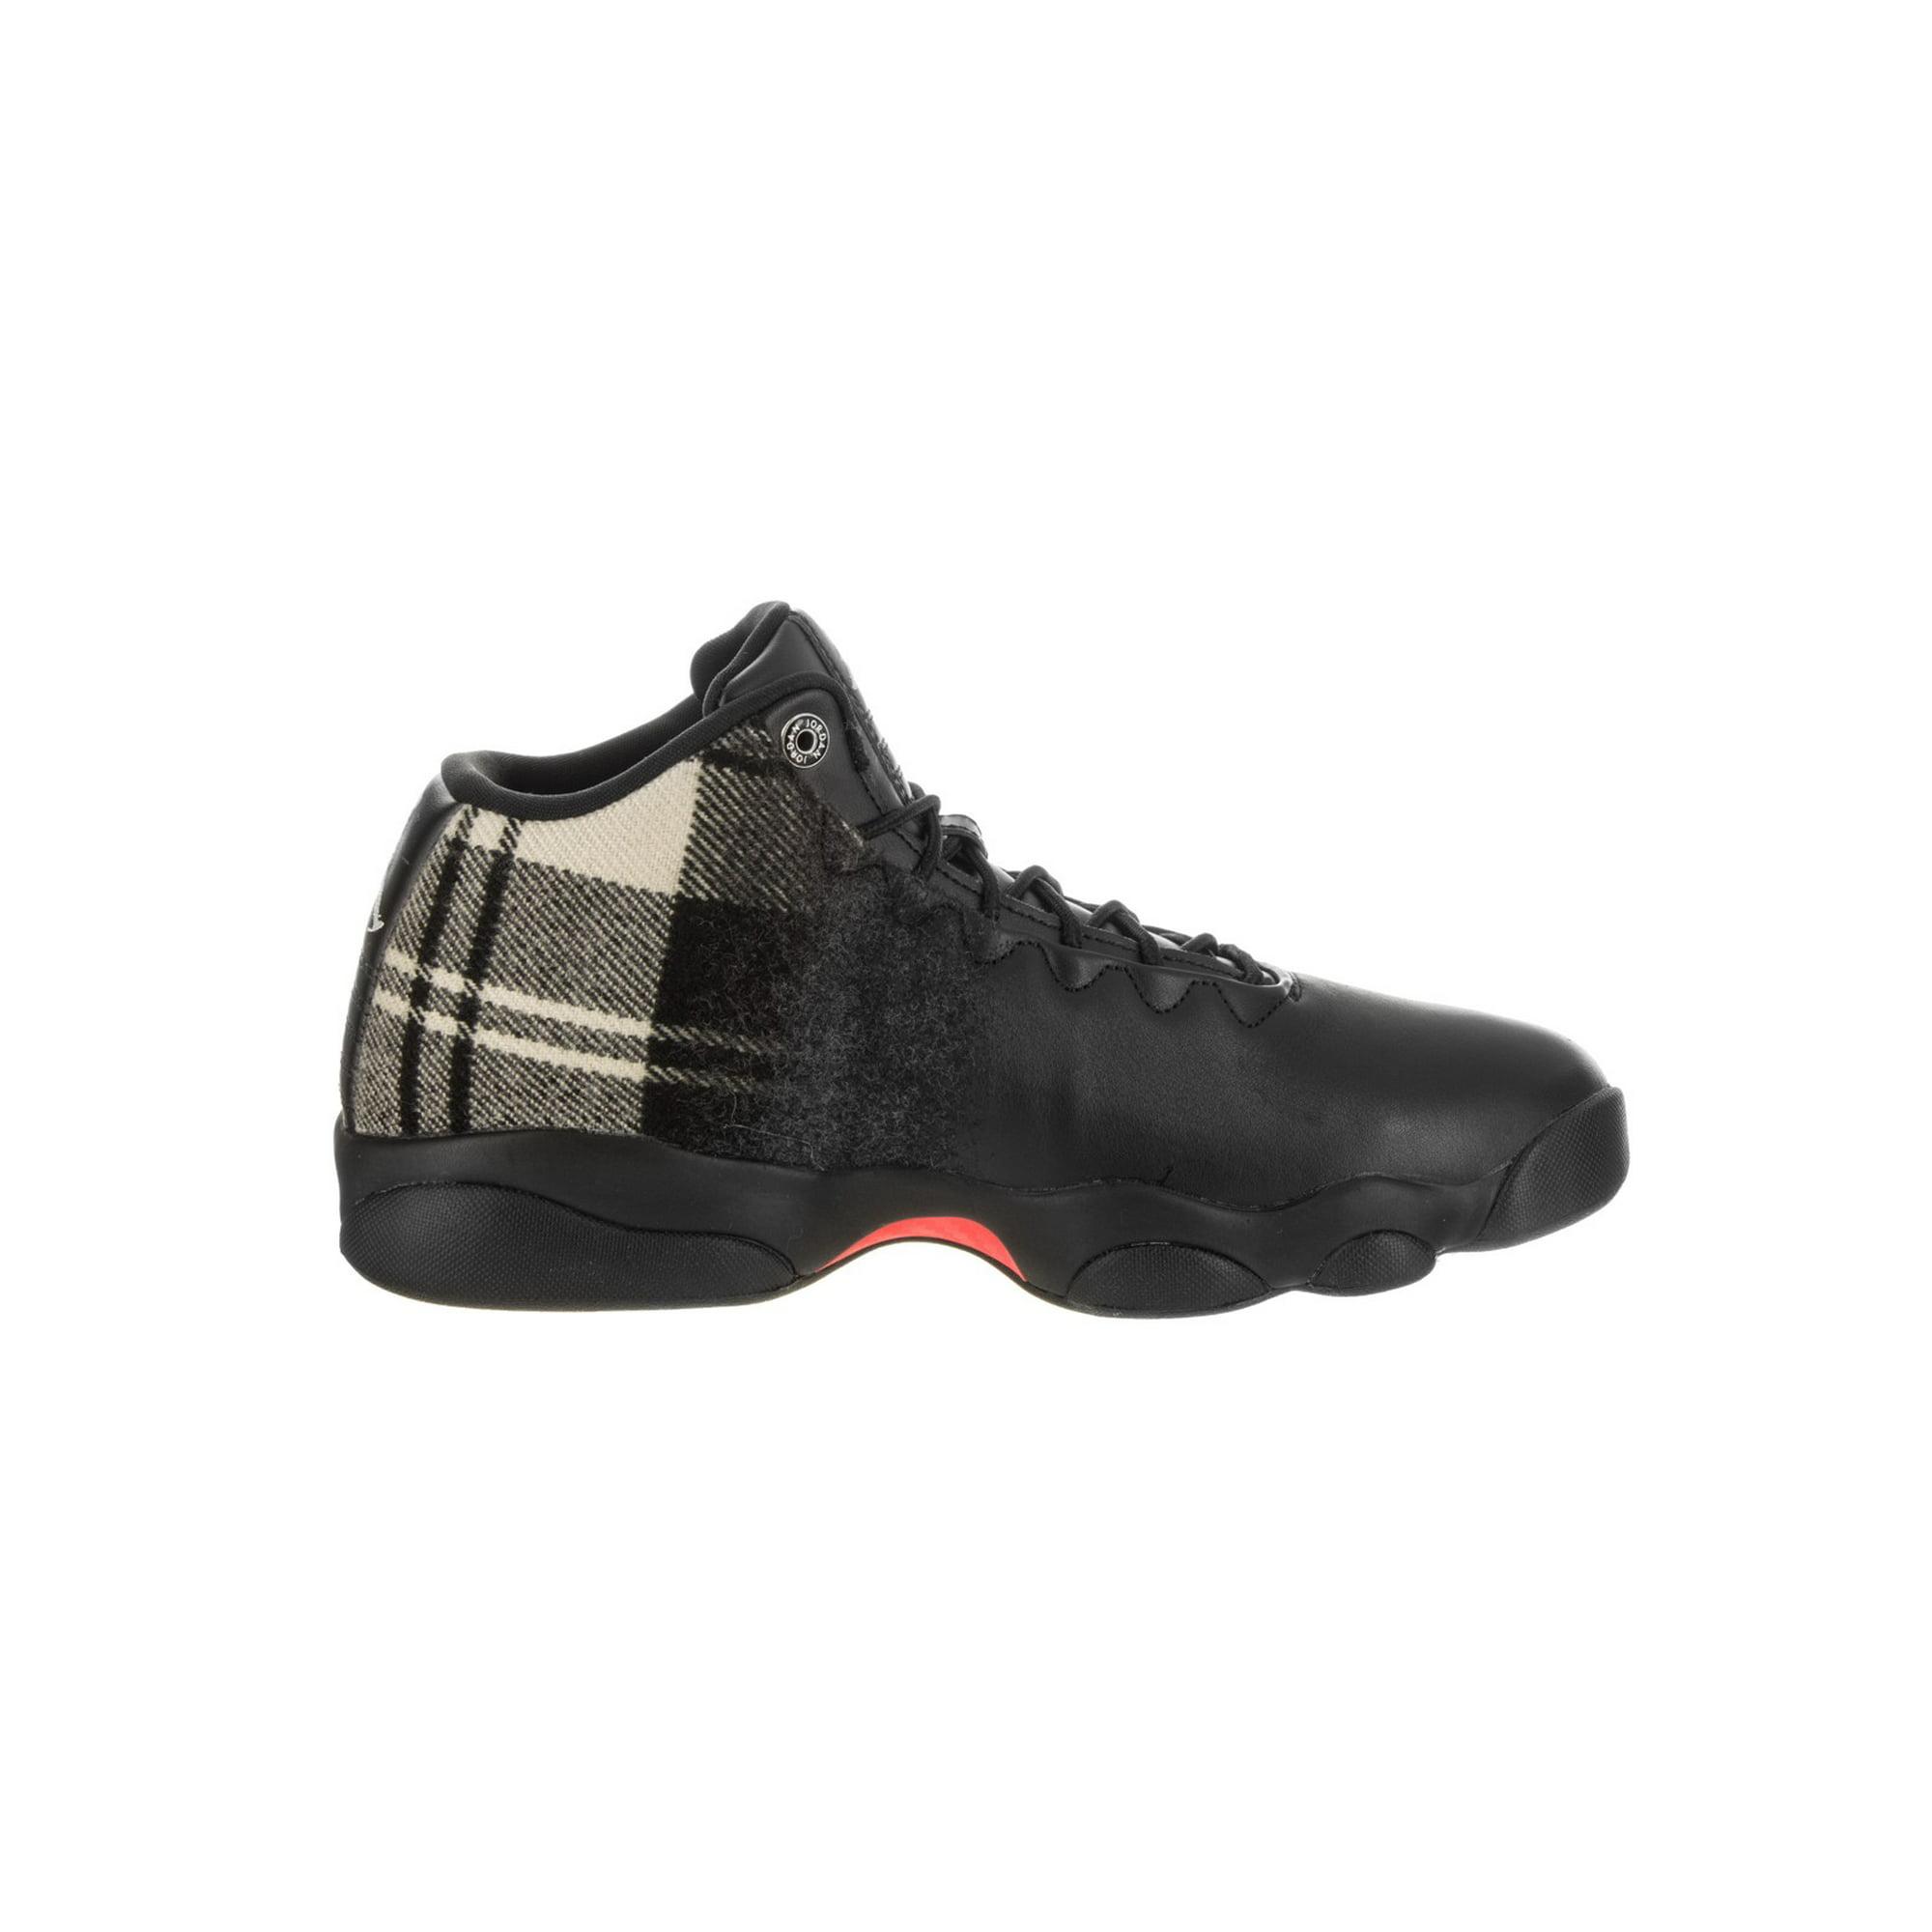 13932375e2b1 Nike Jordan Men s Jordan Horizon Low Premium Basketball Shoe ...